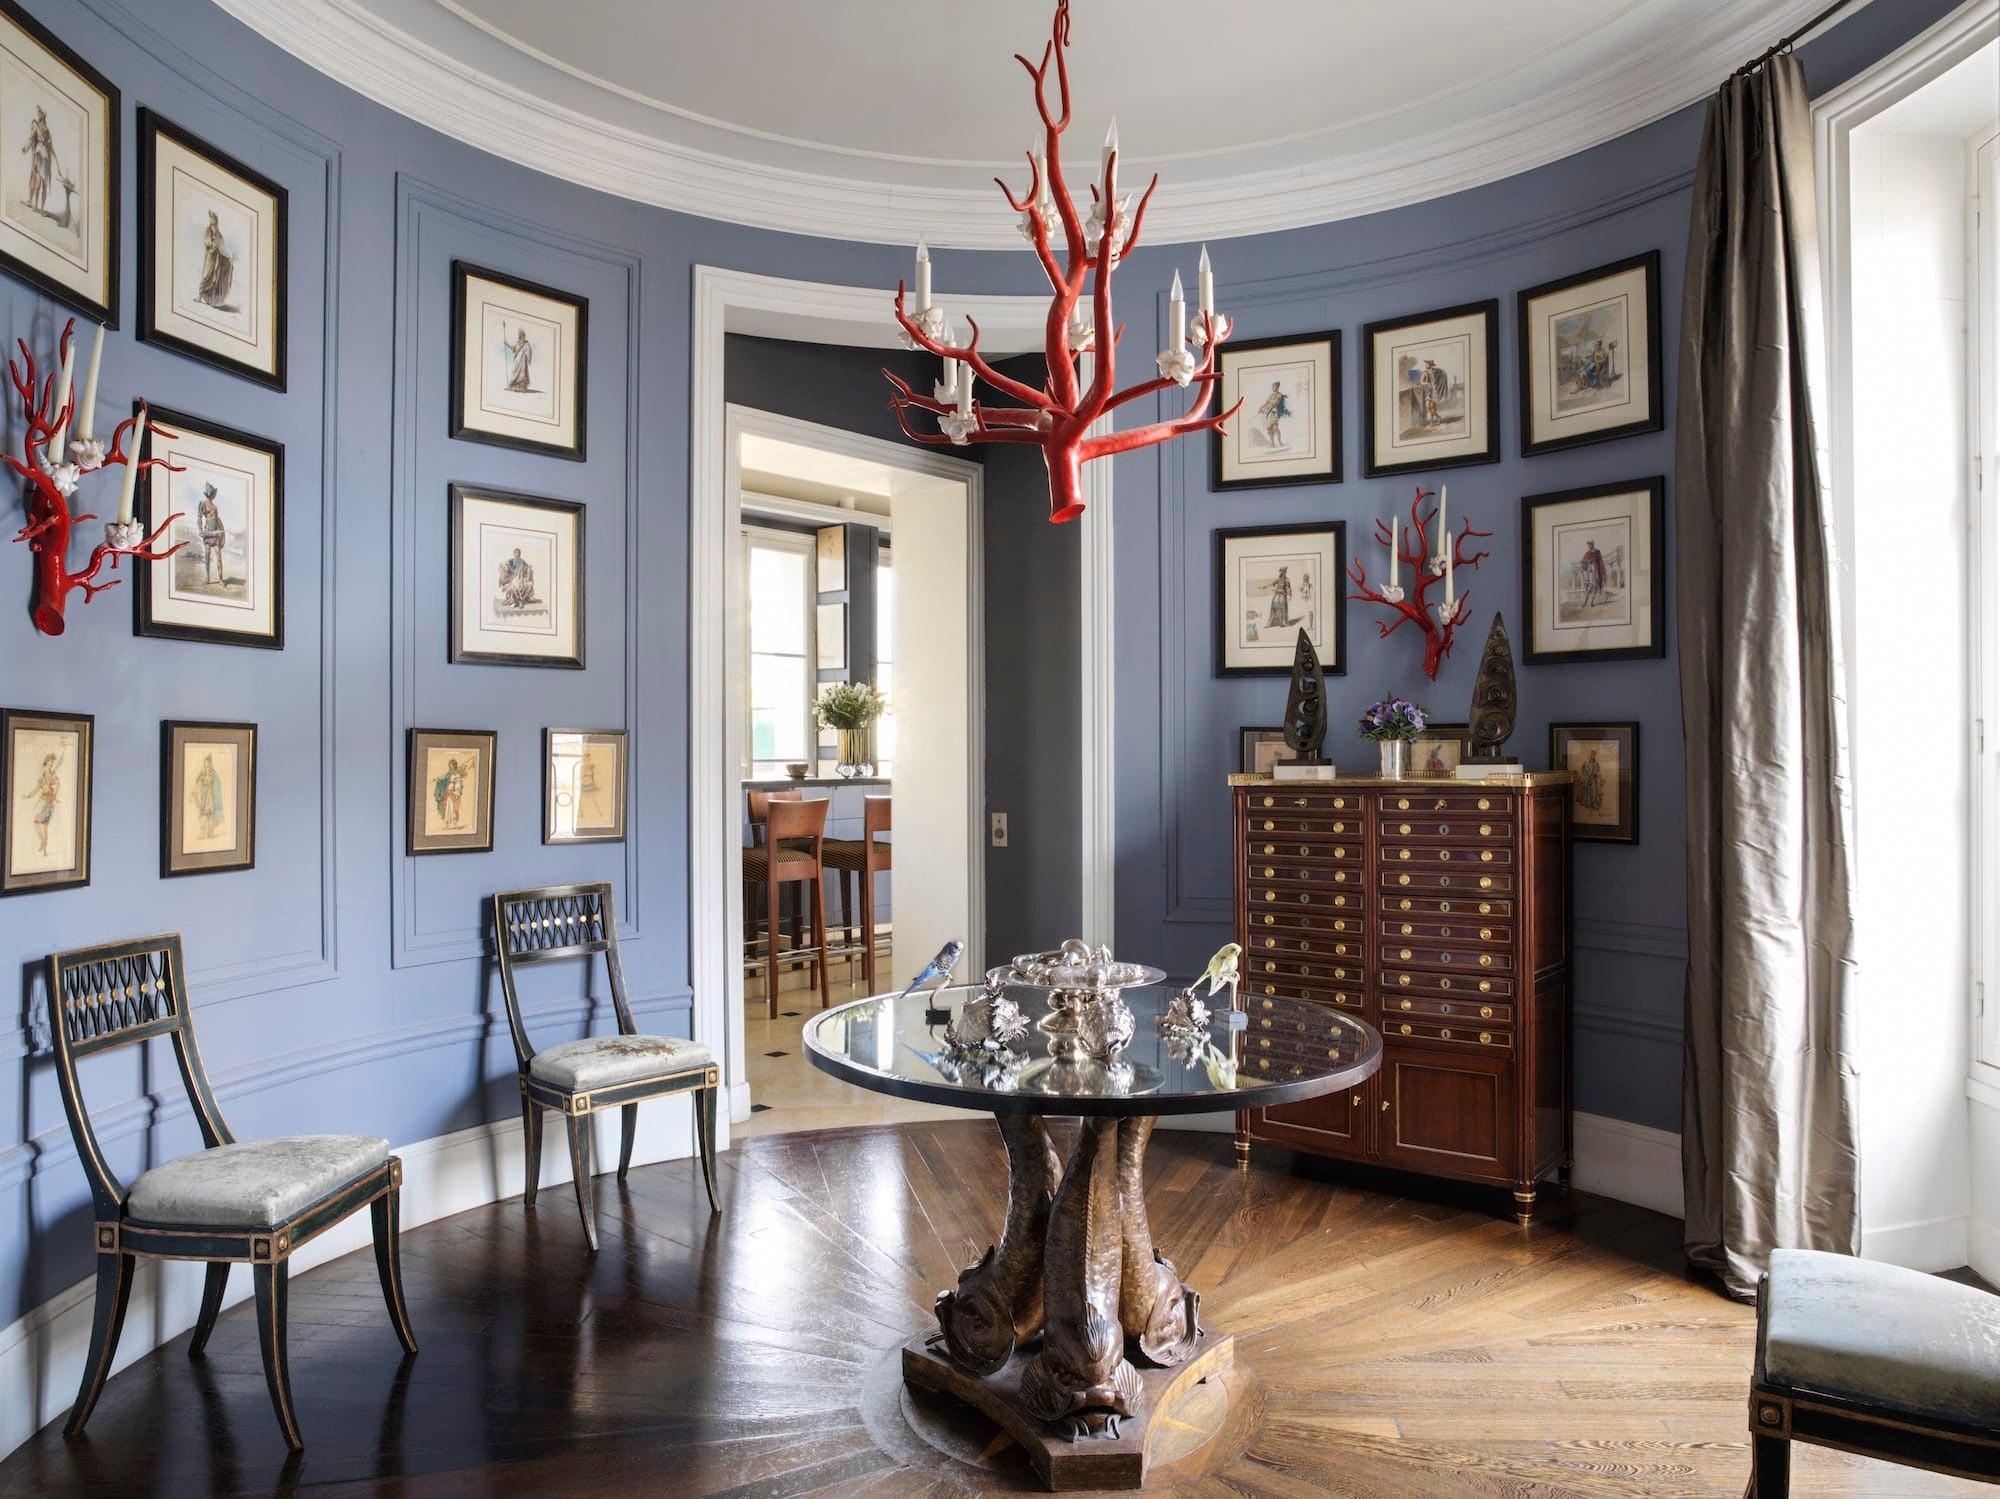 Best Kitchen Gallery: Tour Jamie Creel's Elegant Paris Apartment The Study of Paris Apartment  on rachelxblog.com